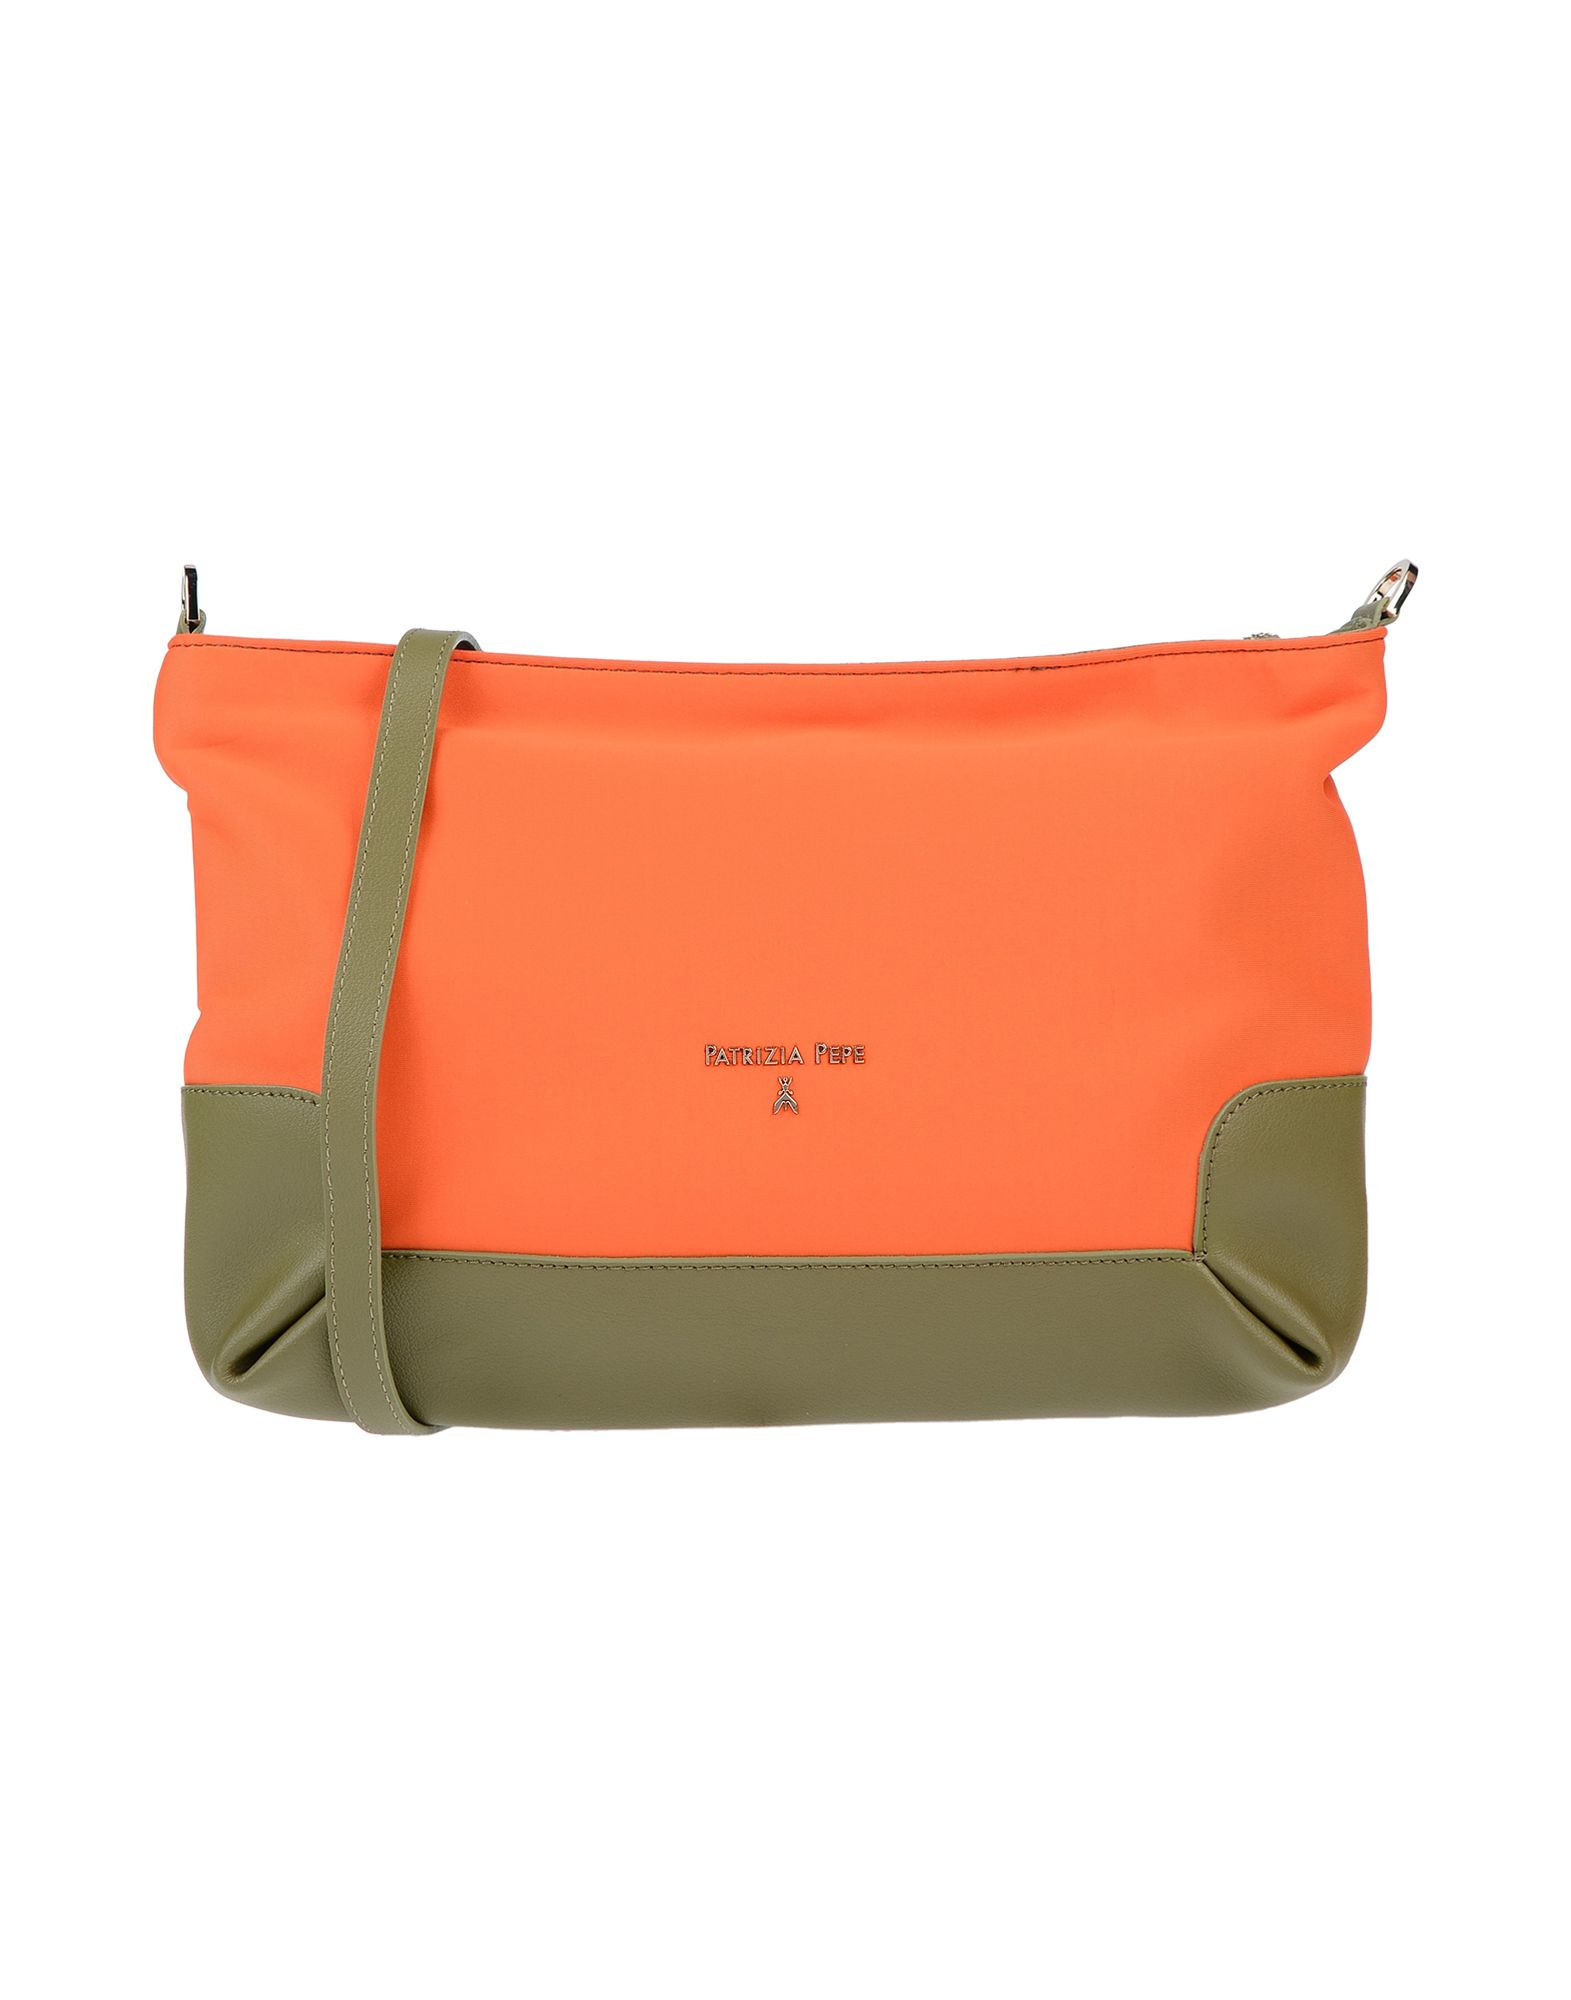 PATRIZIA PEPE Сумка через плечо сумка через плечо anais gvani croco ag 1471 350161